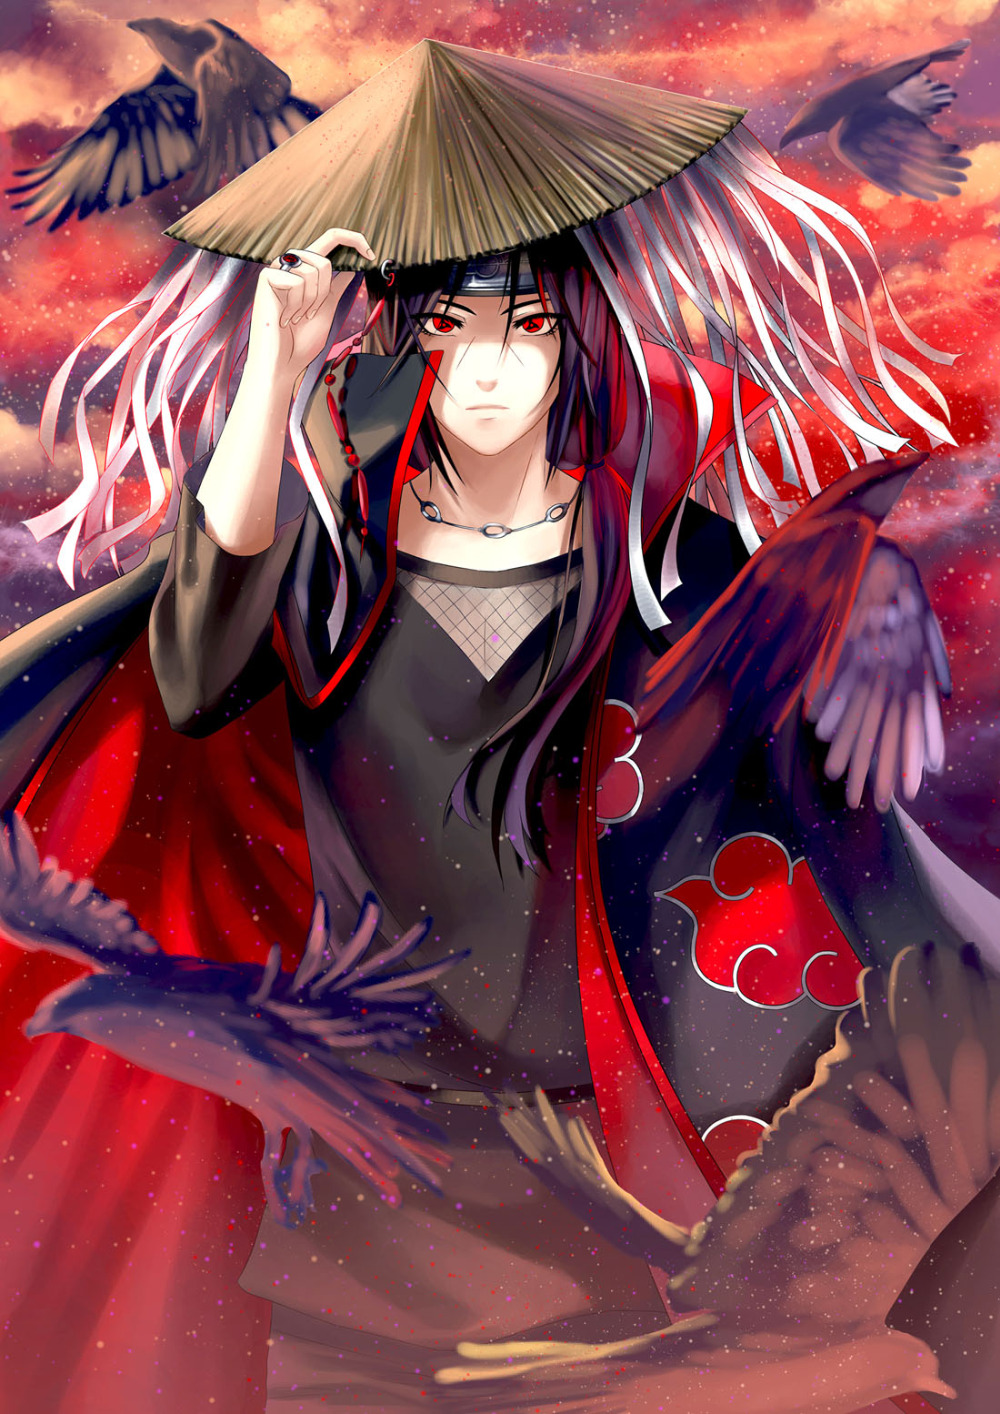 2016 (The vote) P1114-Naruto-Uchiha-font-b-Itachi-b-font-Anime-Wallpaper-Poster-Wall-font-b-Art-b